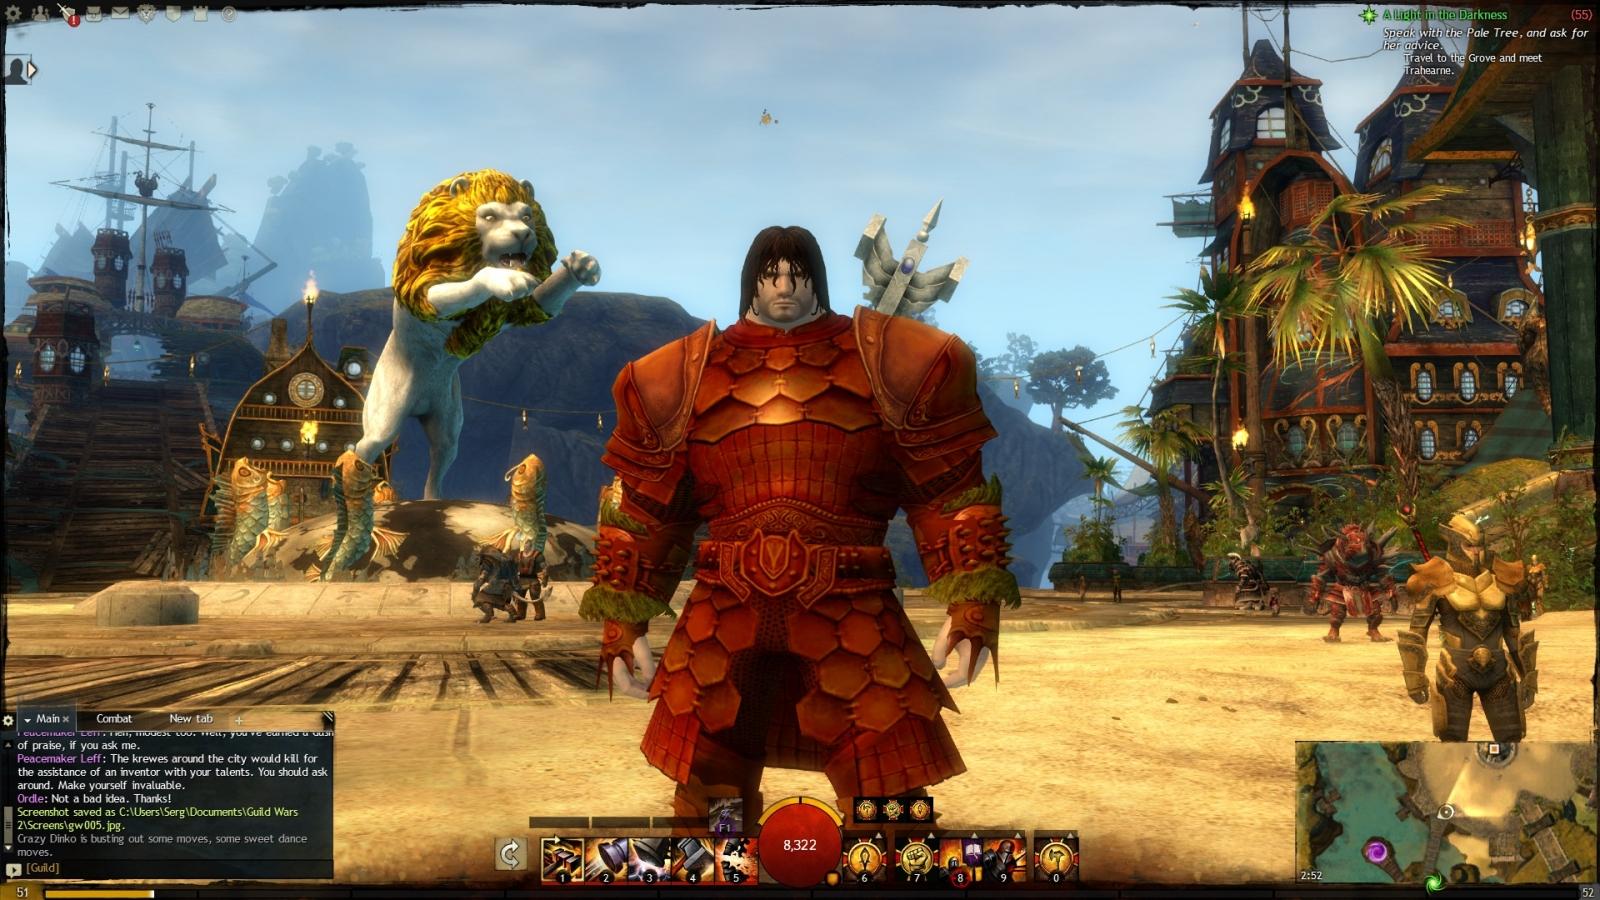 Norn - Warrior